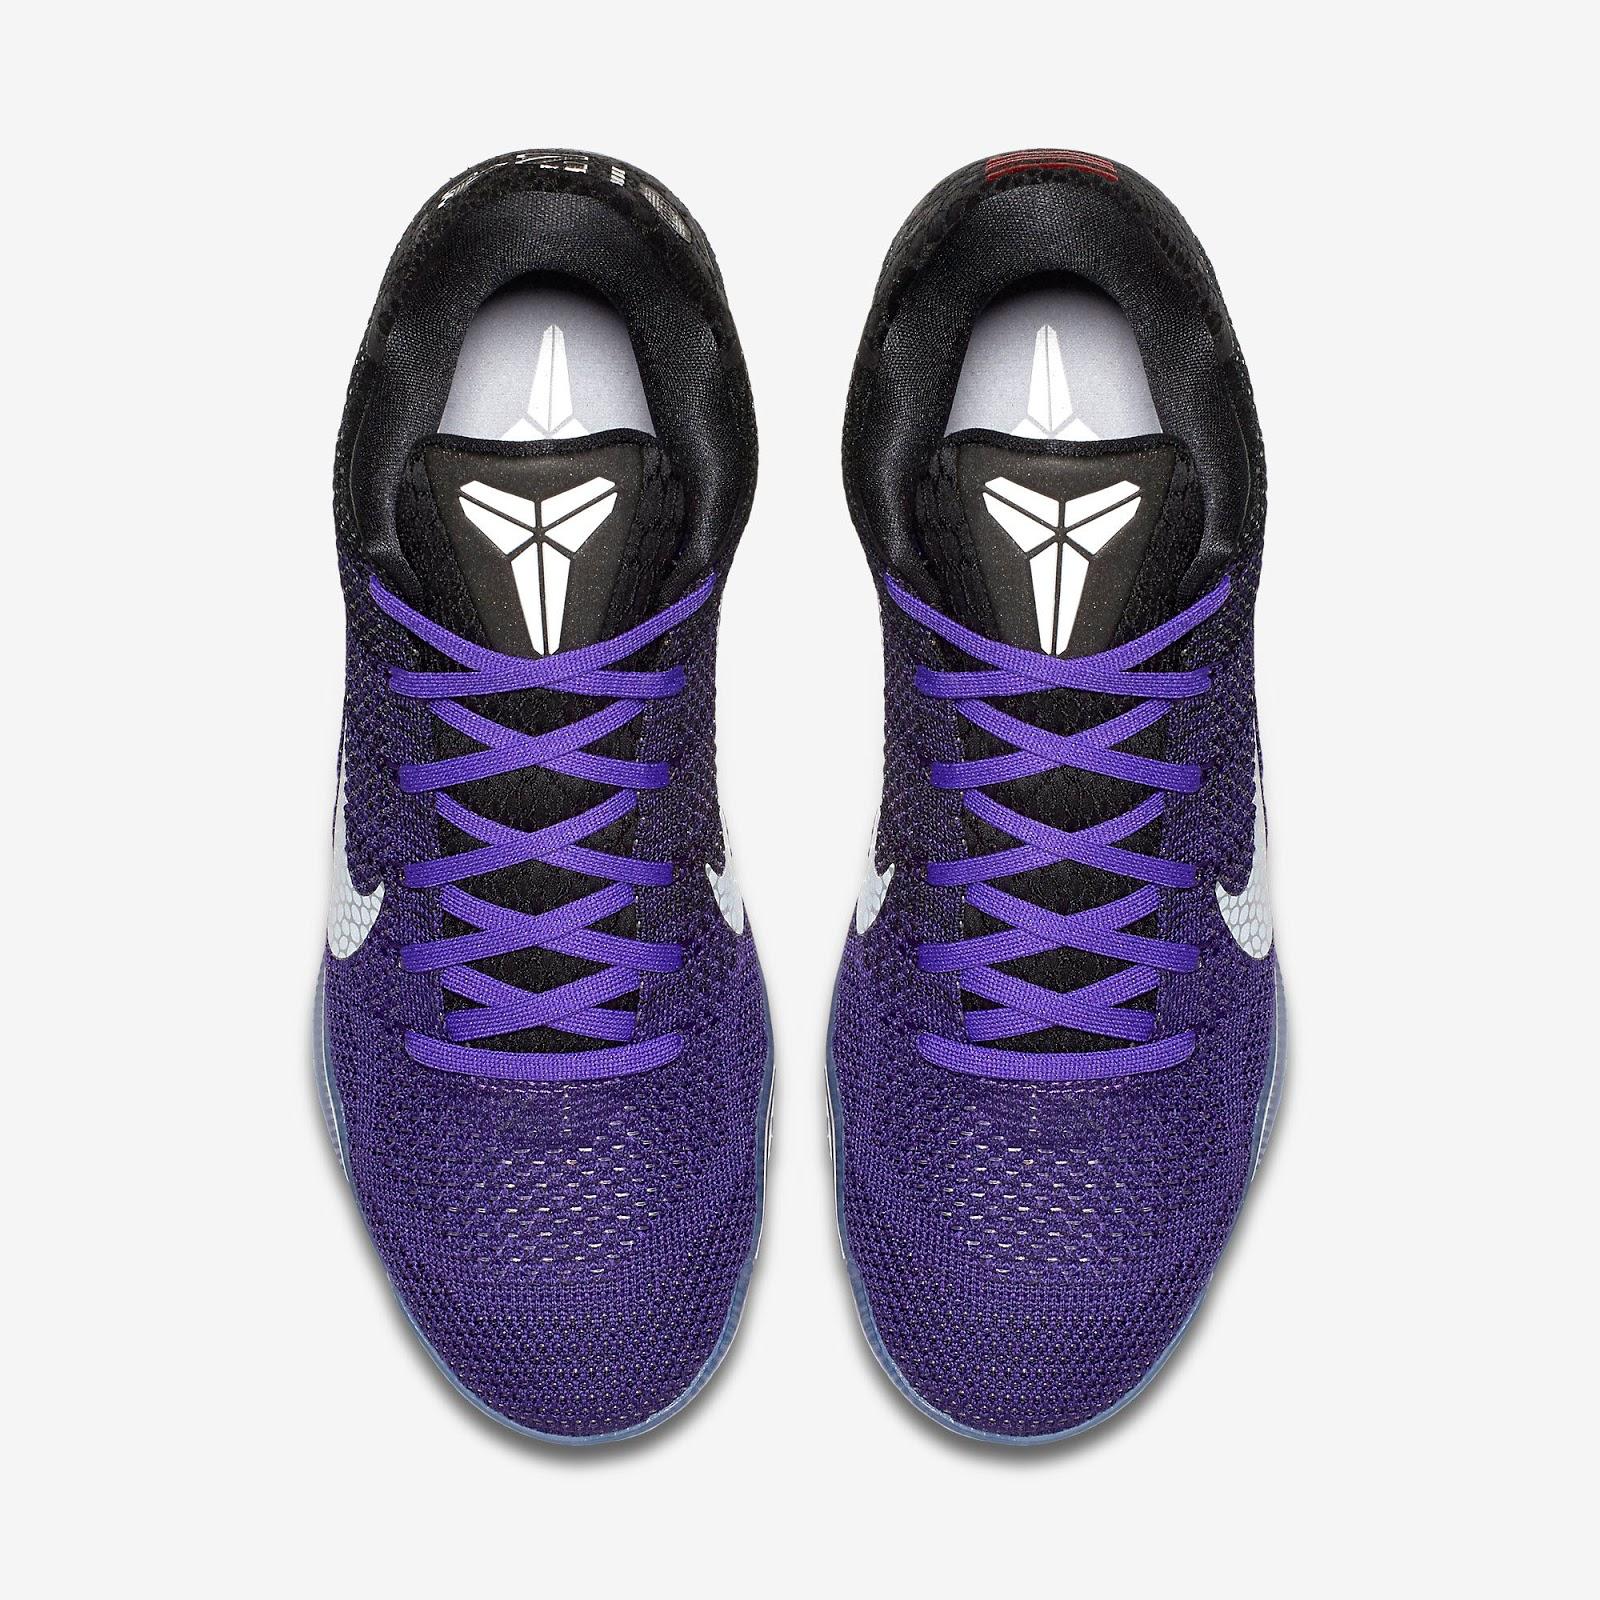 brand new d071b 01146 ajordanxi Your  1 Source For Sneaker Release Dates  Nike Kobe 11 Elite Low